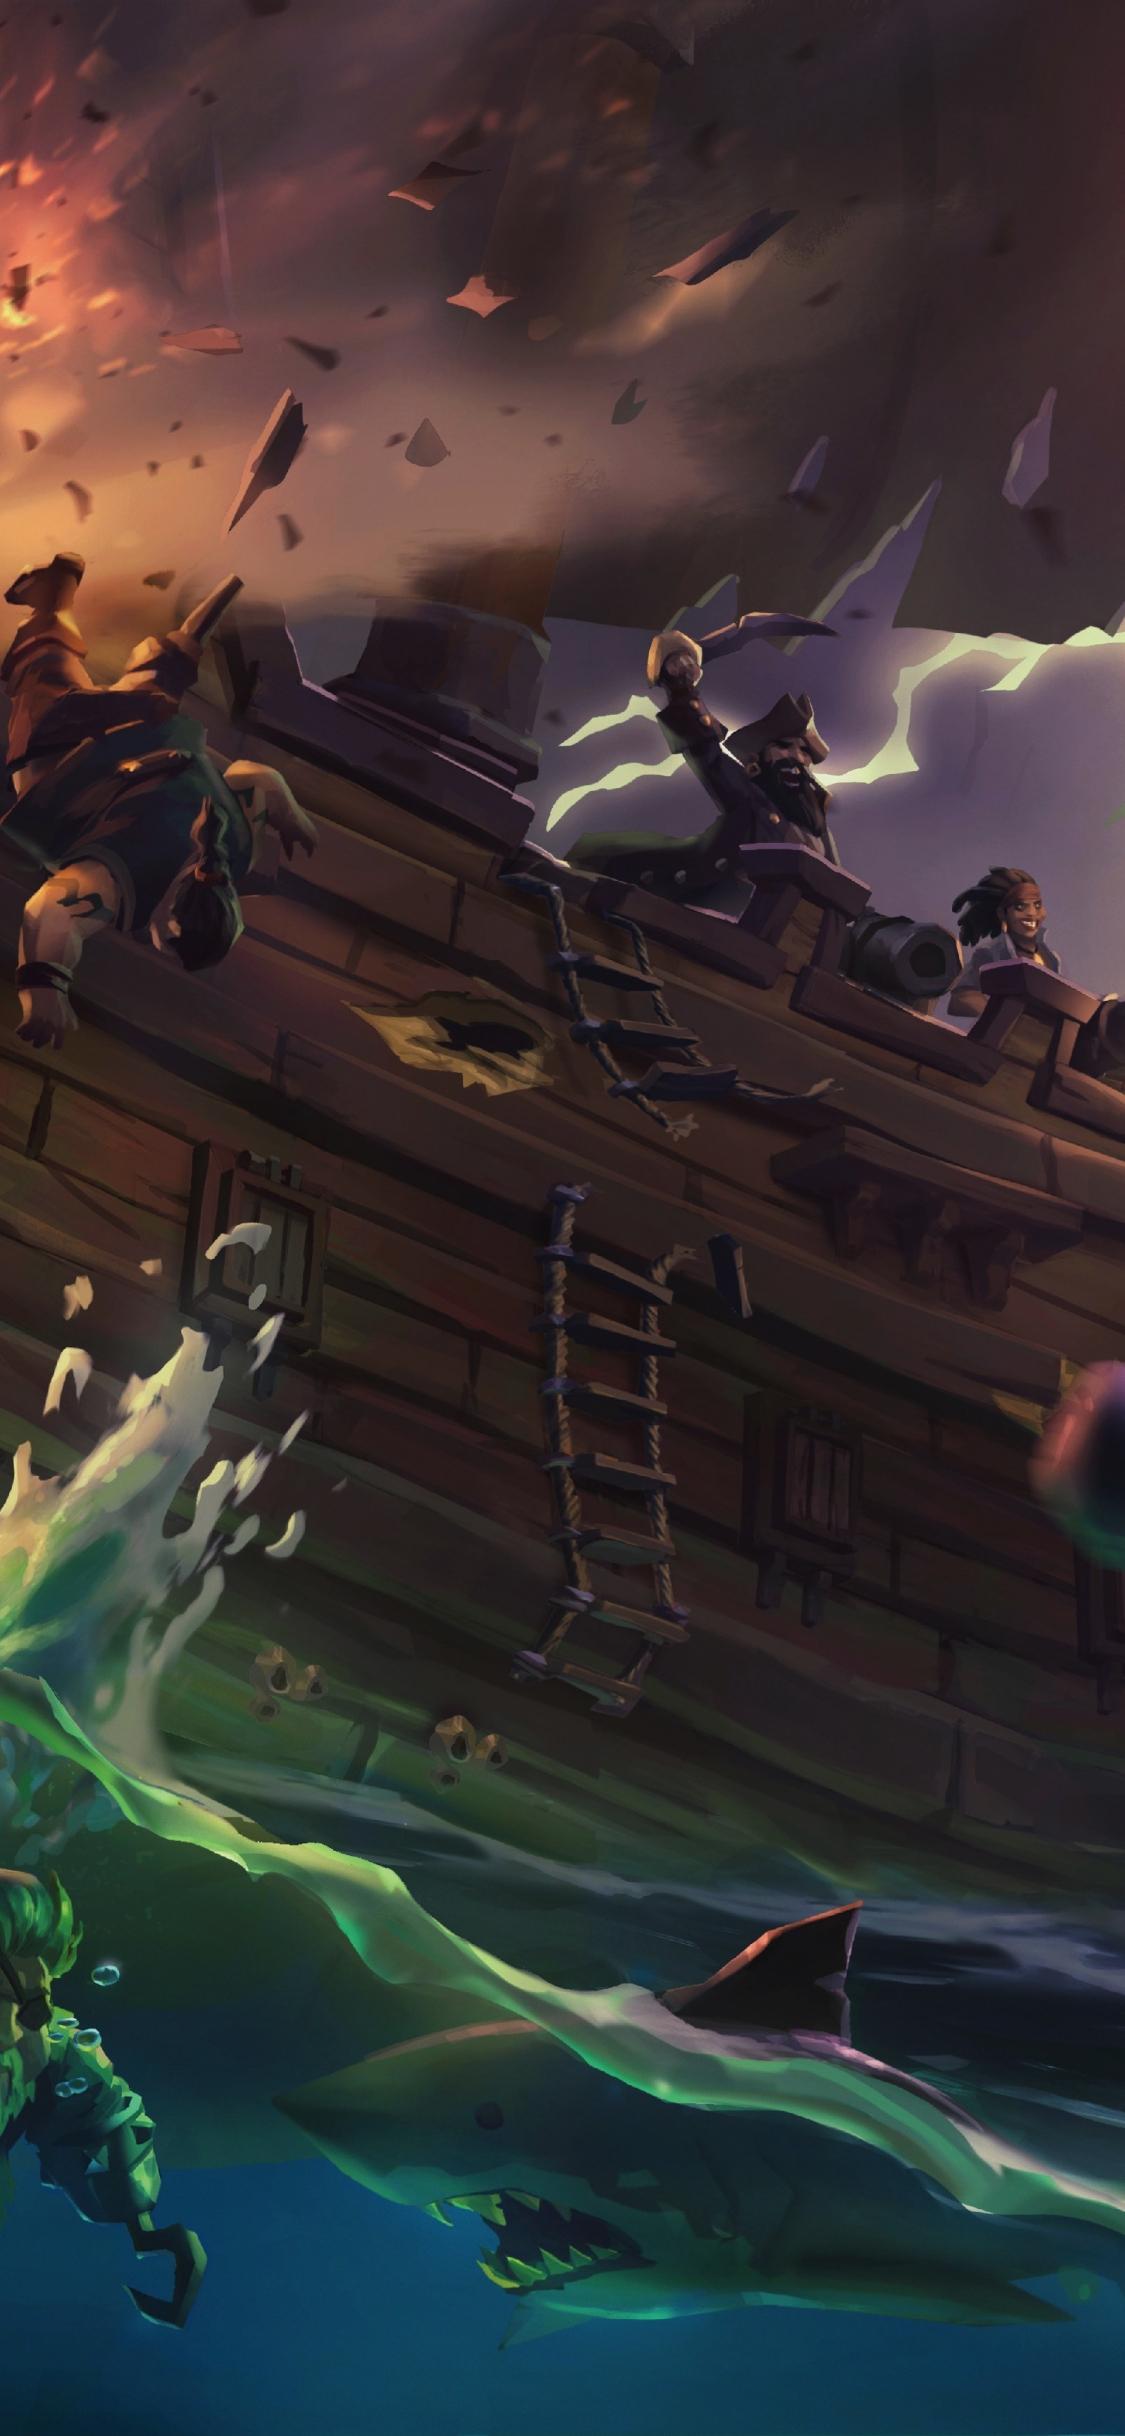 Download 1125x2436 Wallpaper Sea Of Thieves Ship Pirates